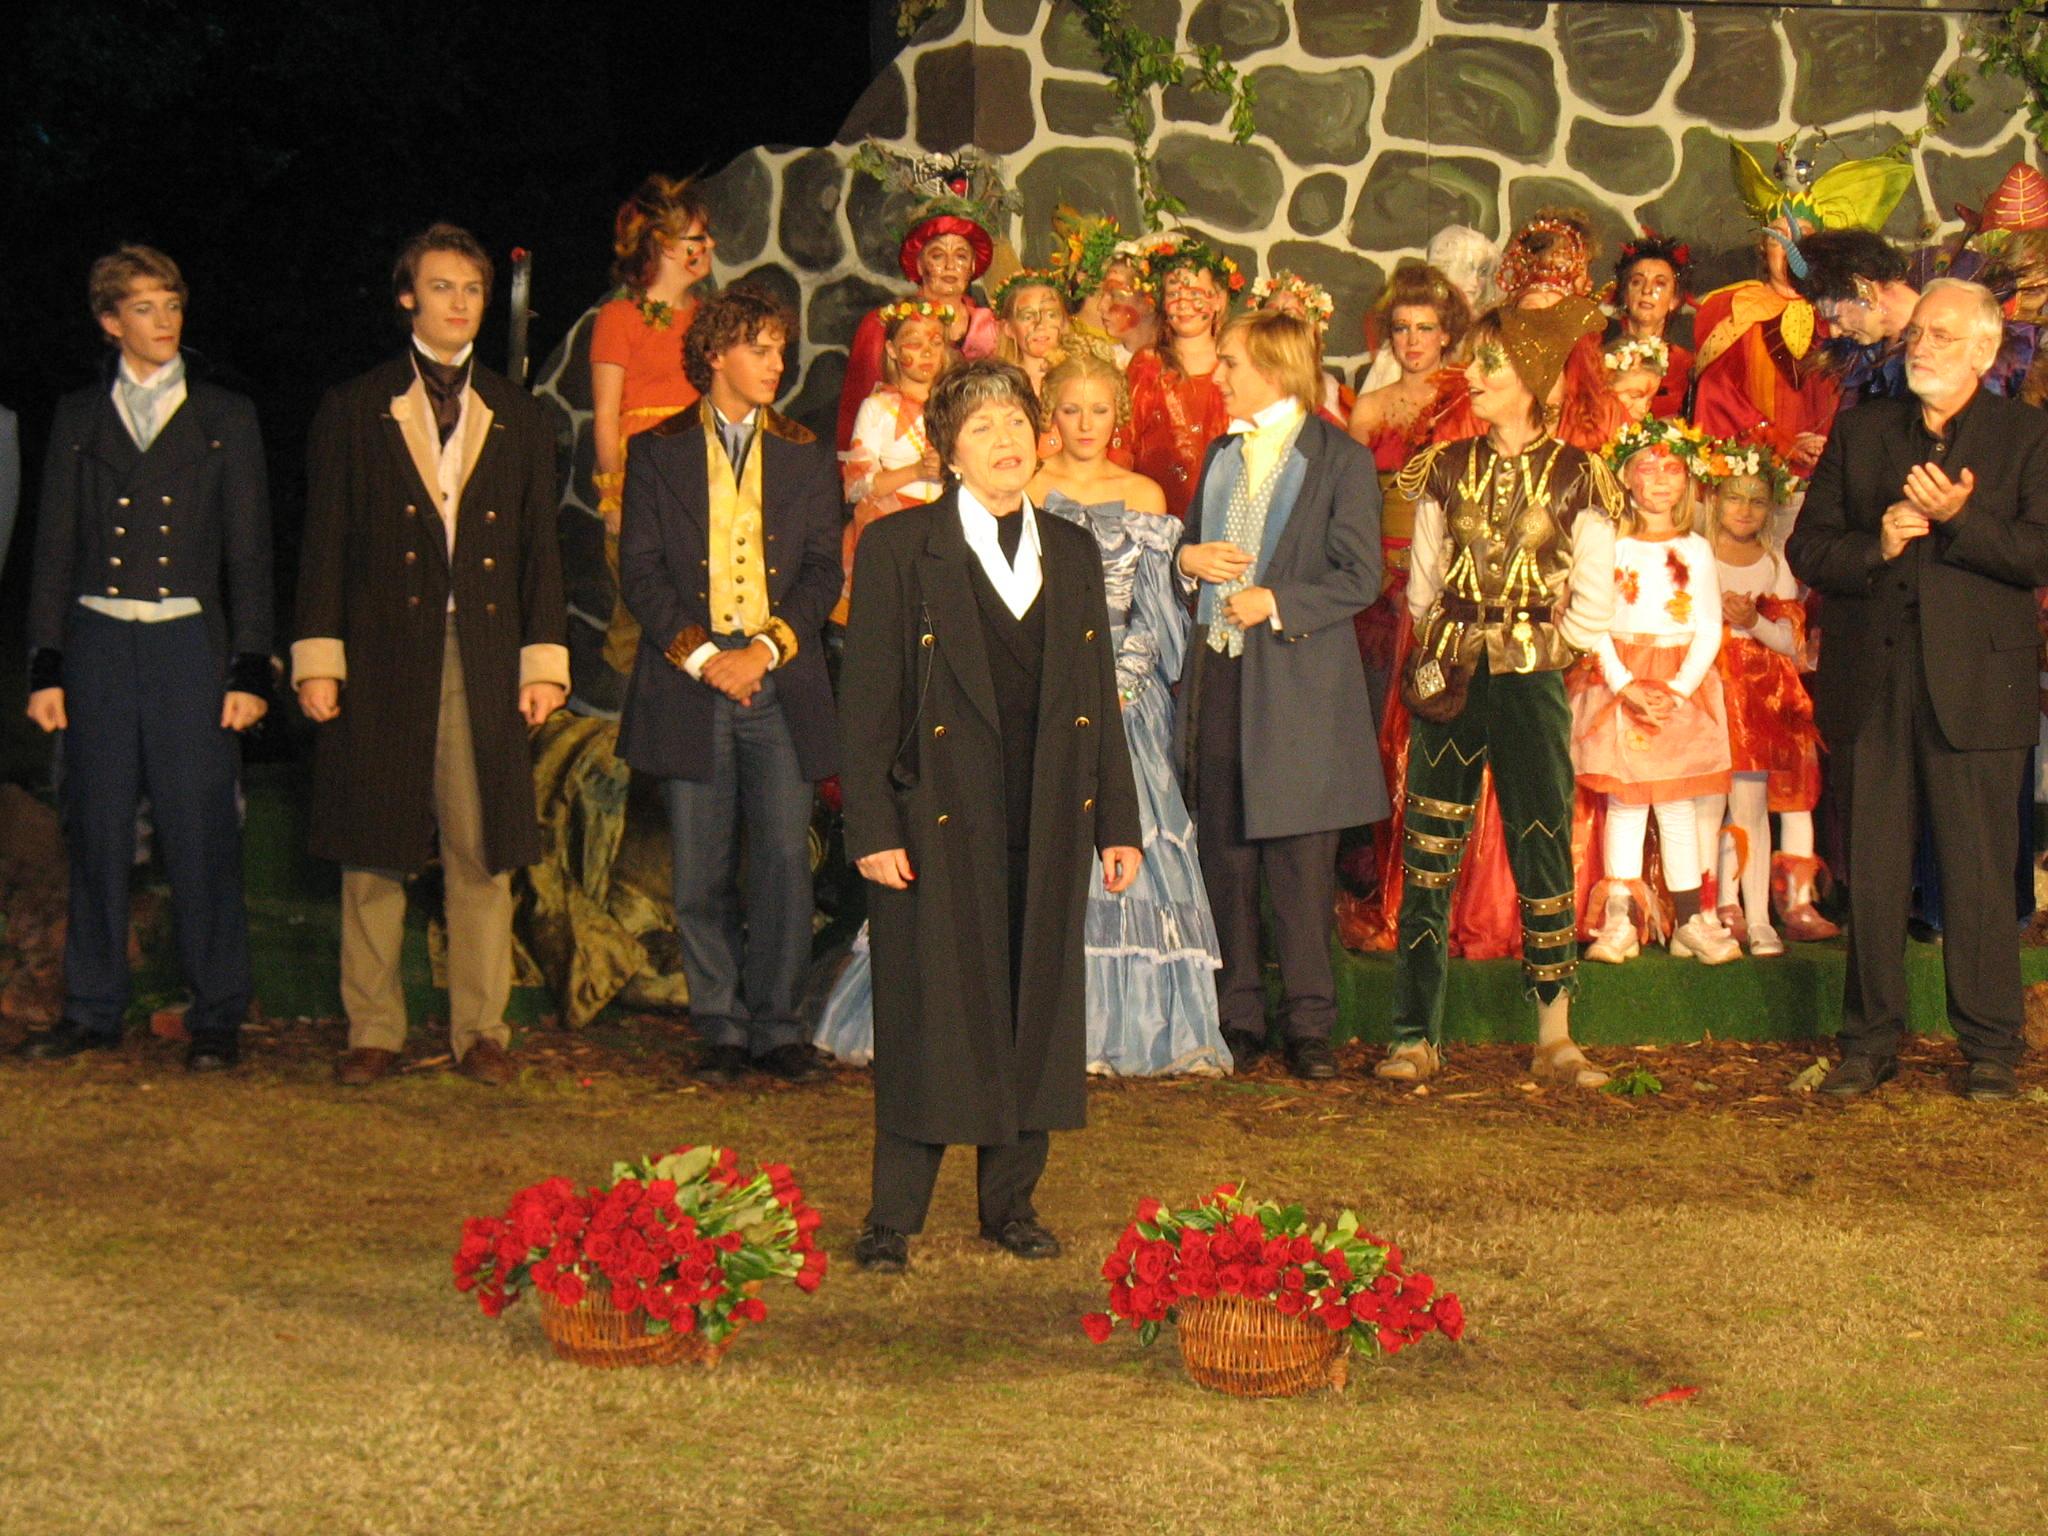 TfJ-Sommernacht2006 (12)